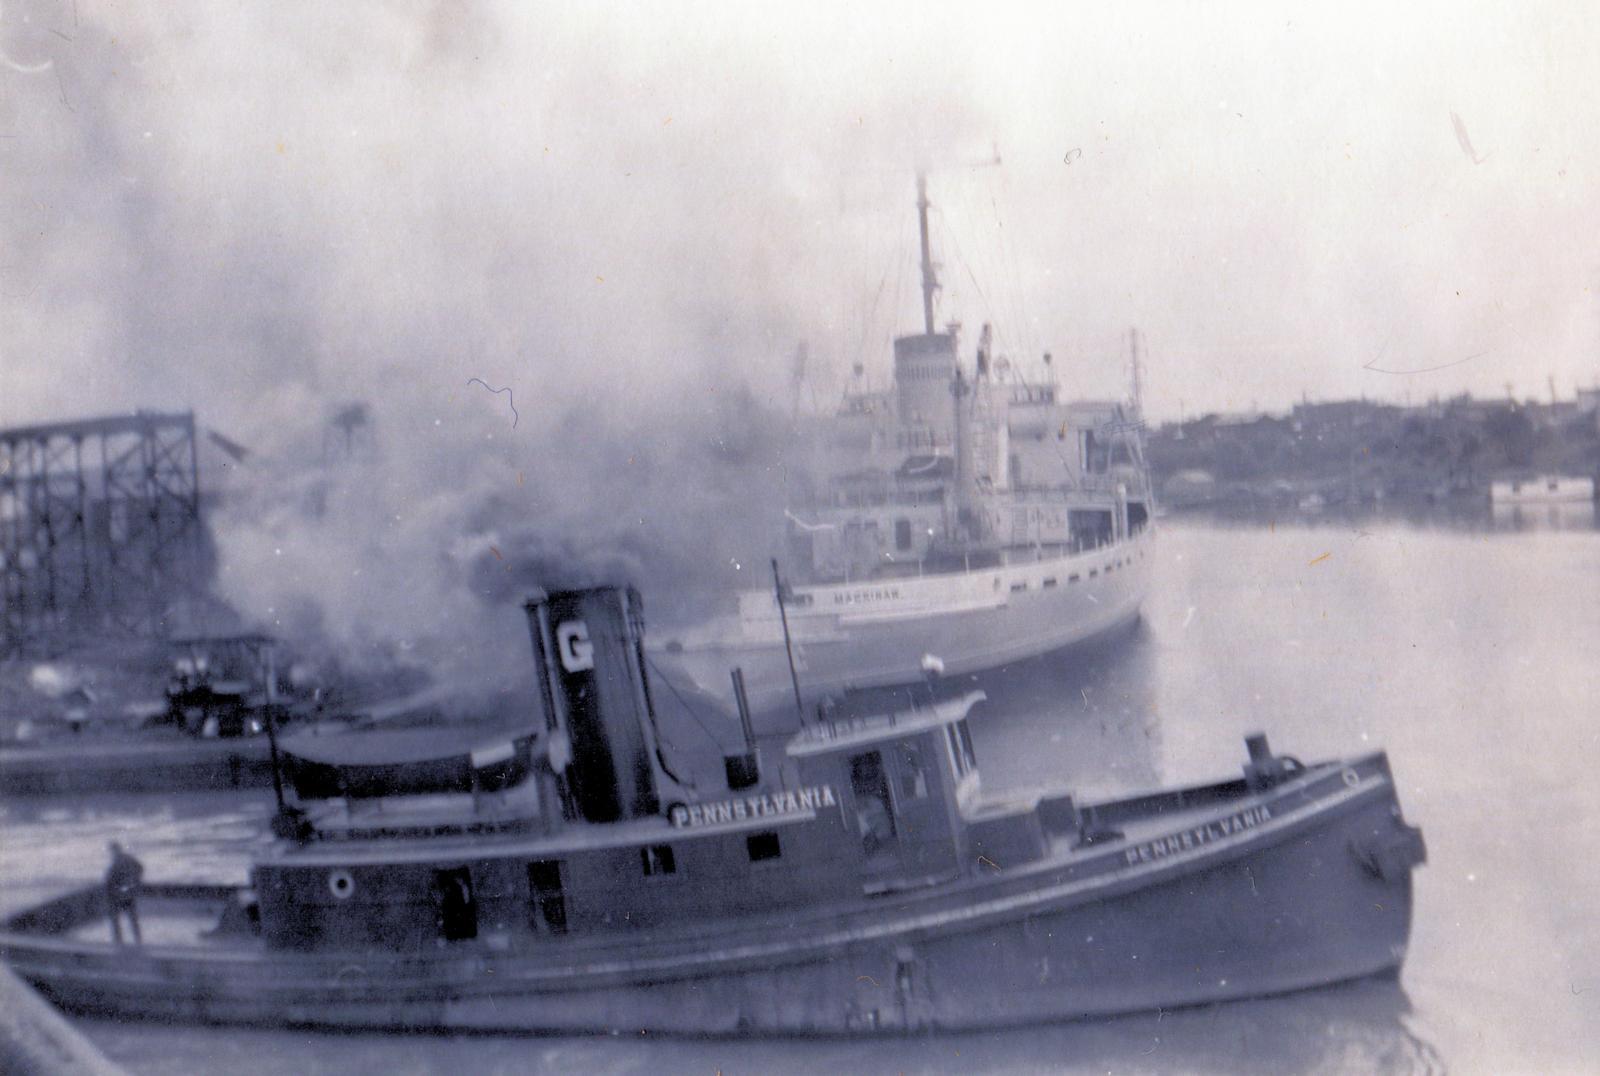 PENNSYLVANIA (1911, Tug (Towboat))